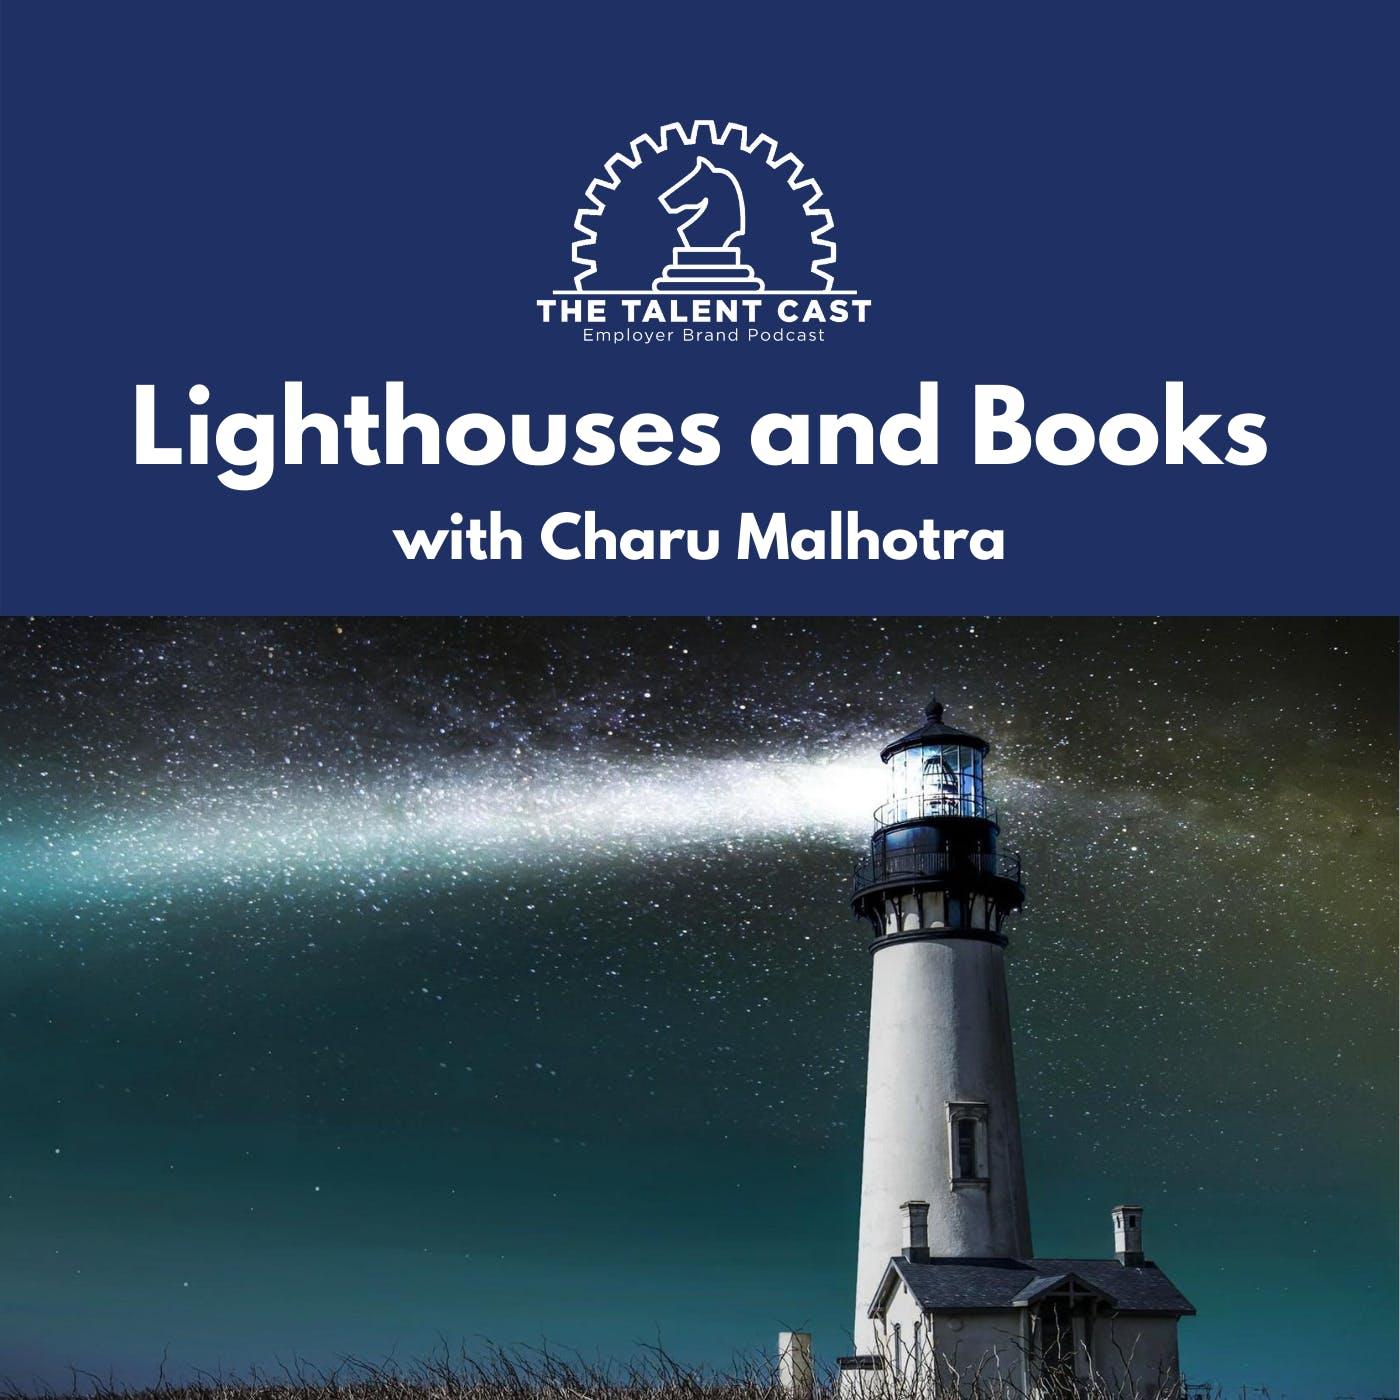 Lighthouses and Books with Charu Malhotra